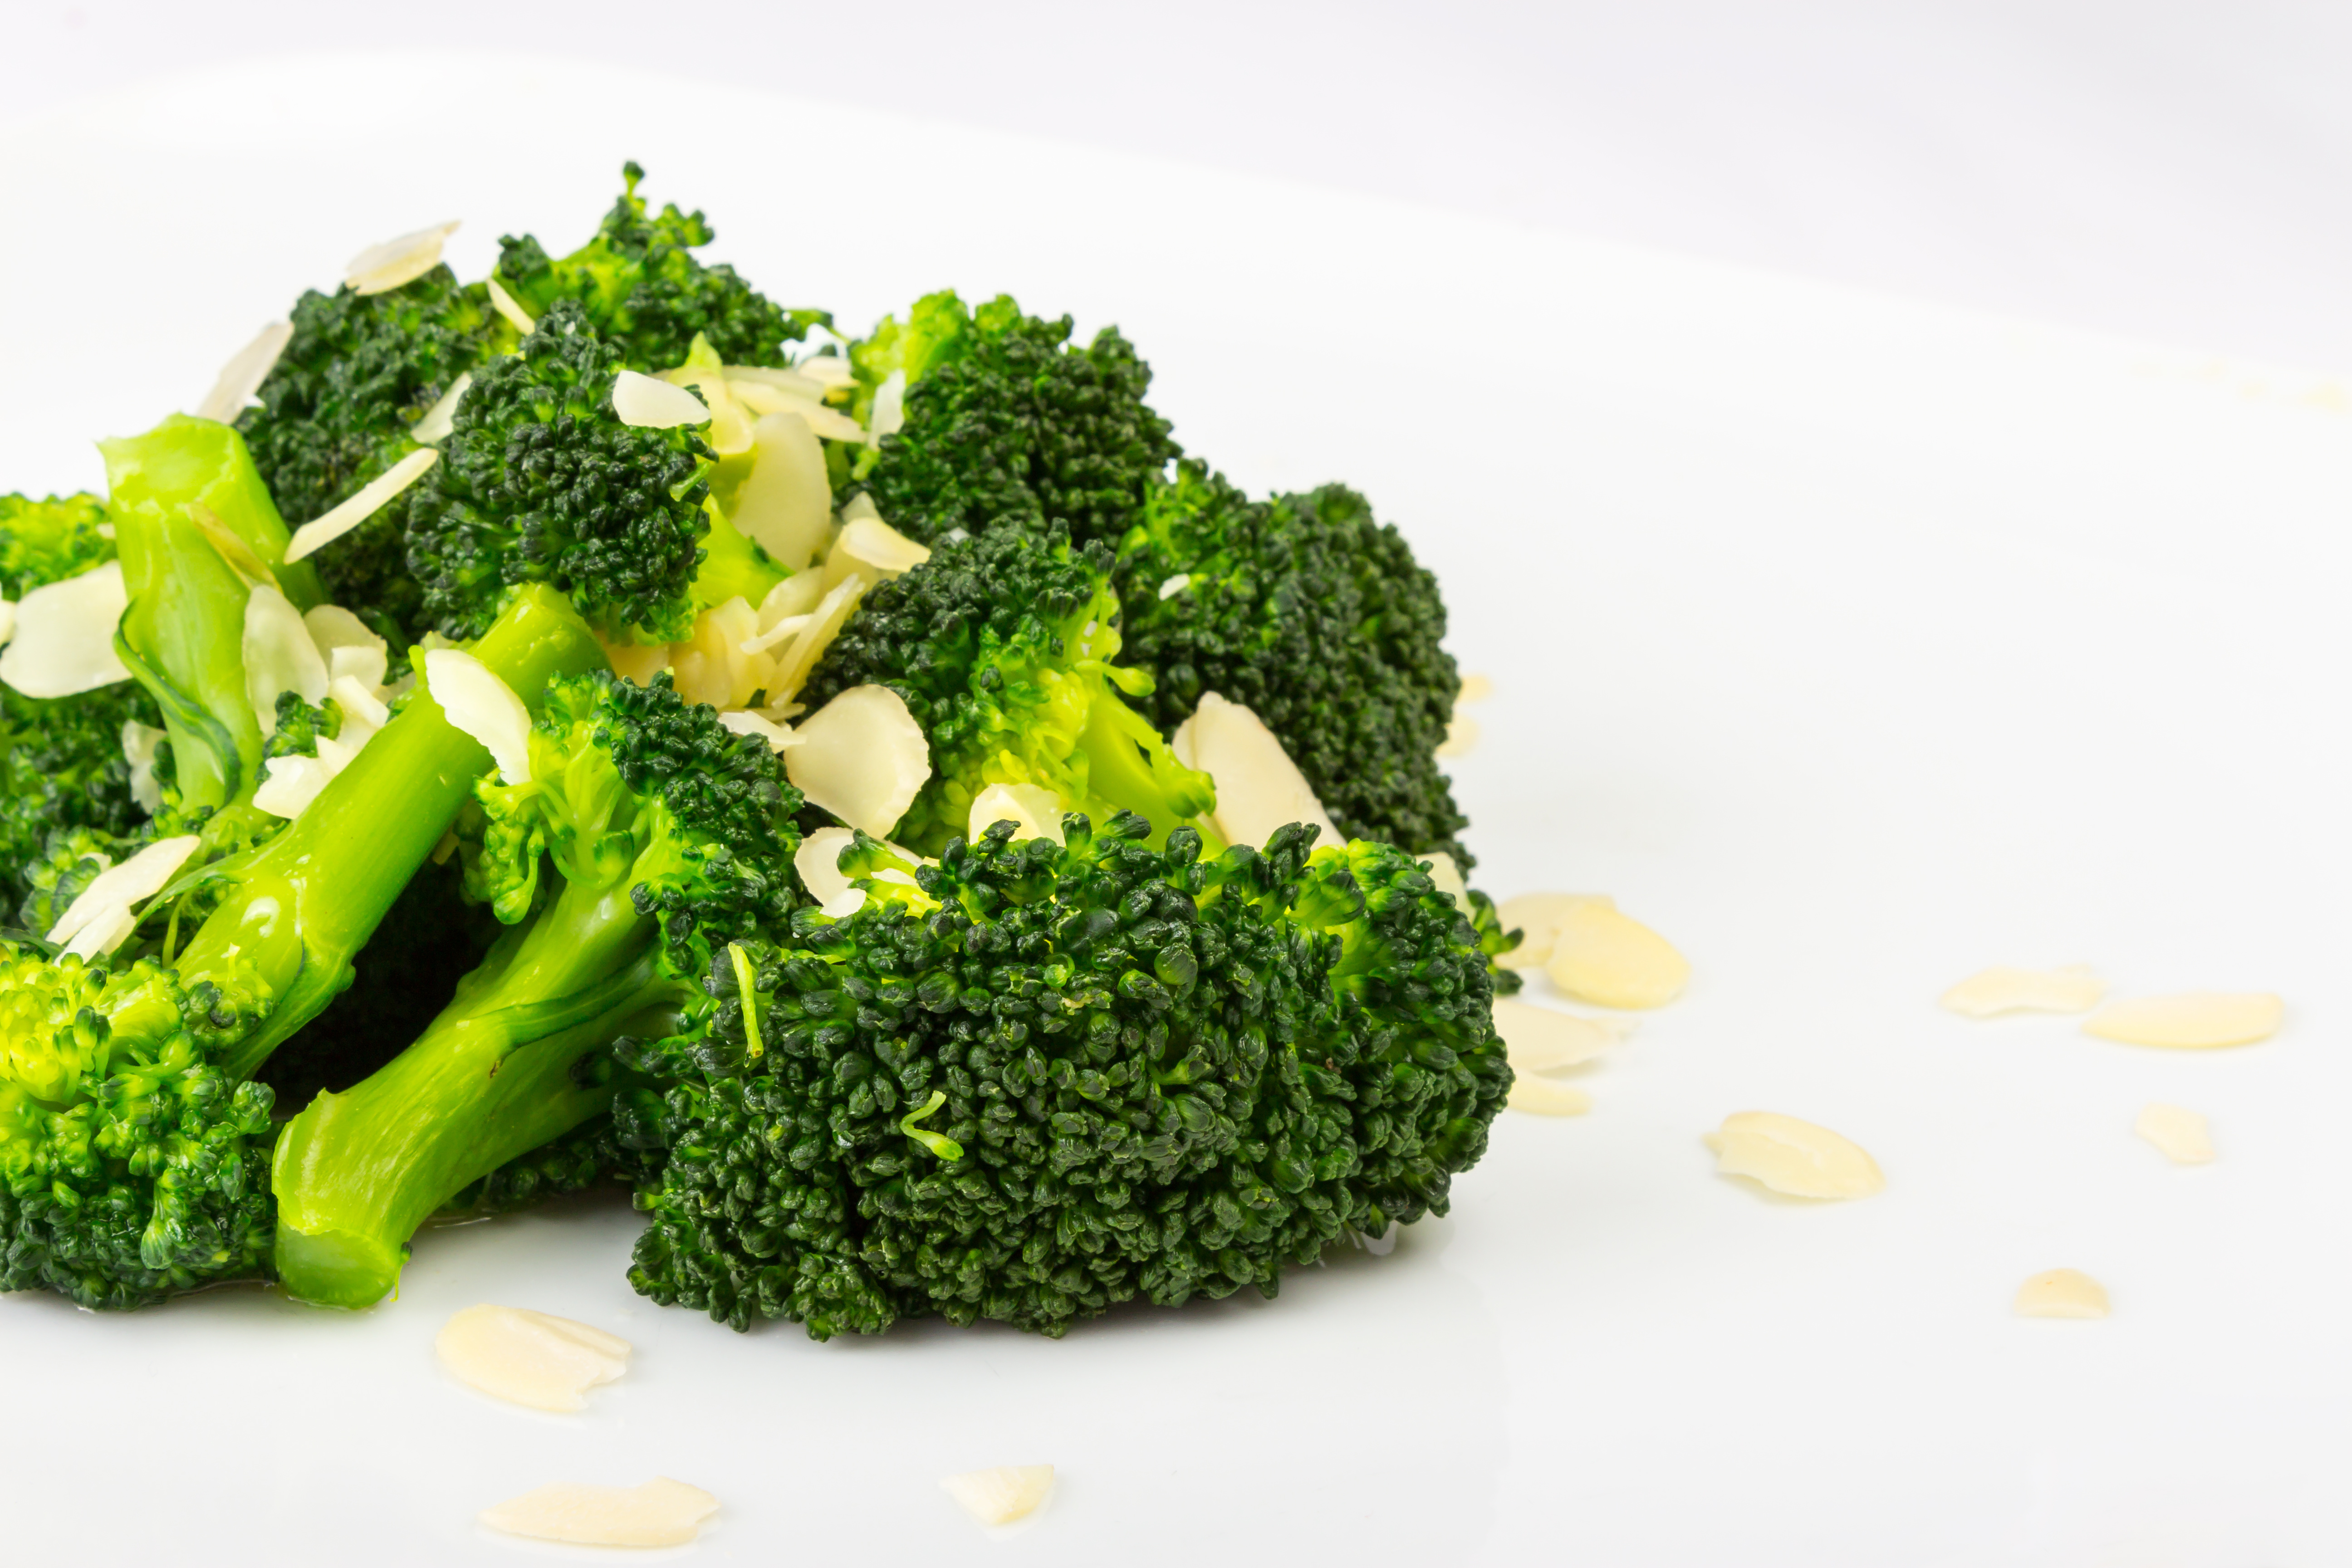 Image for Sauteed Broccoli with Parmesan